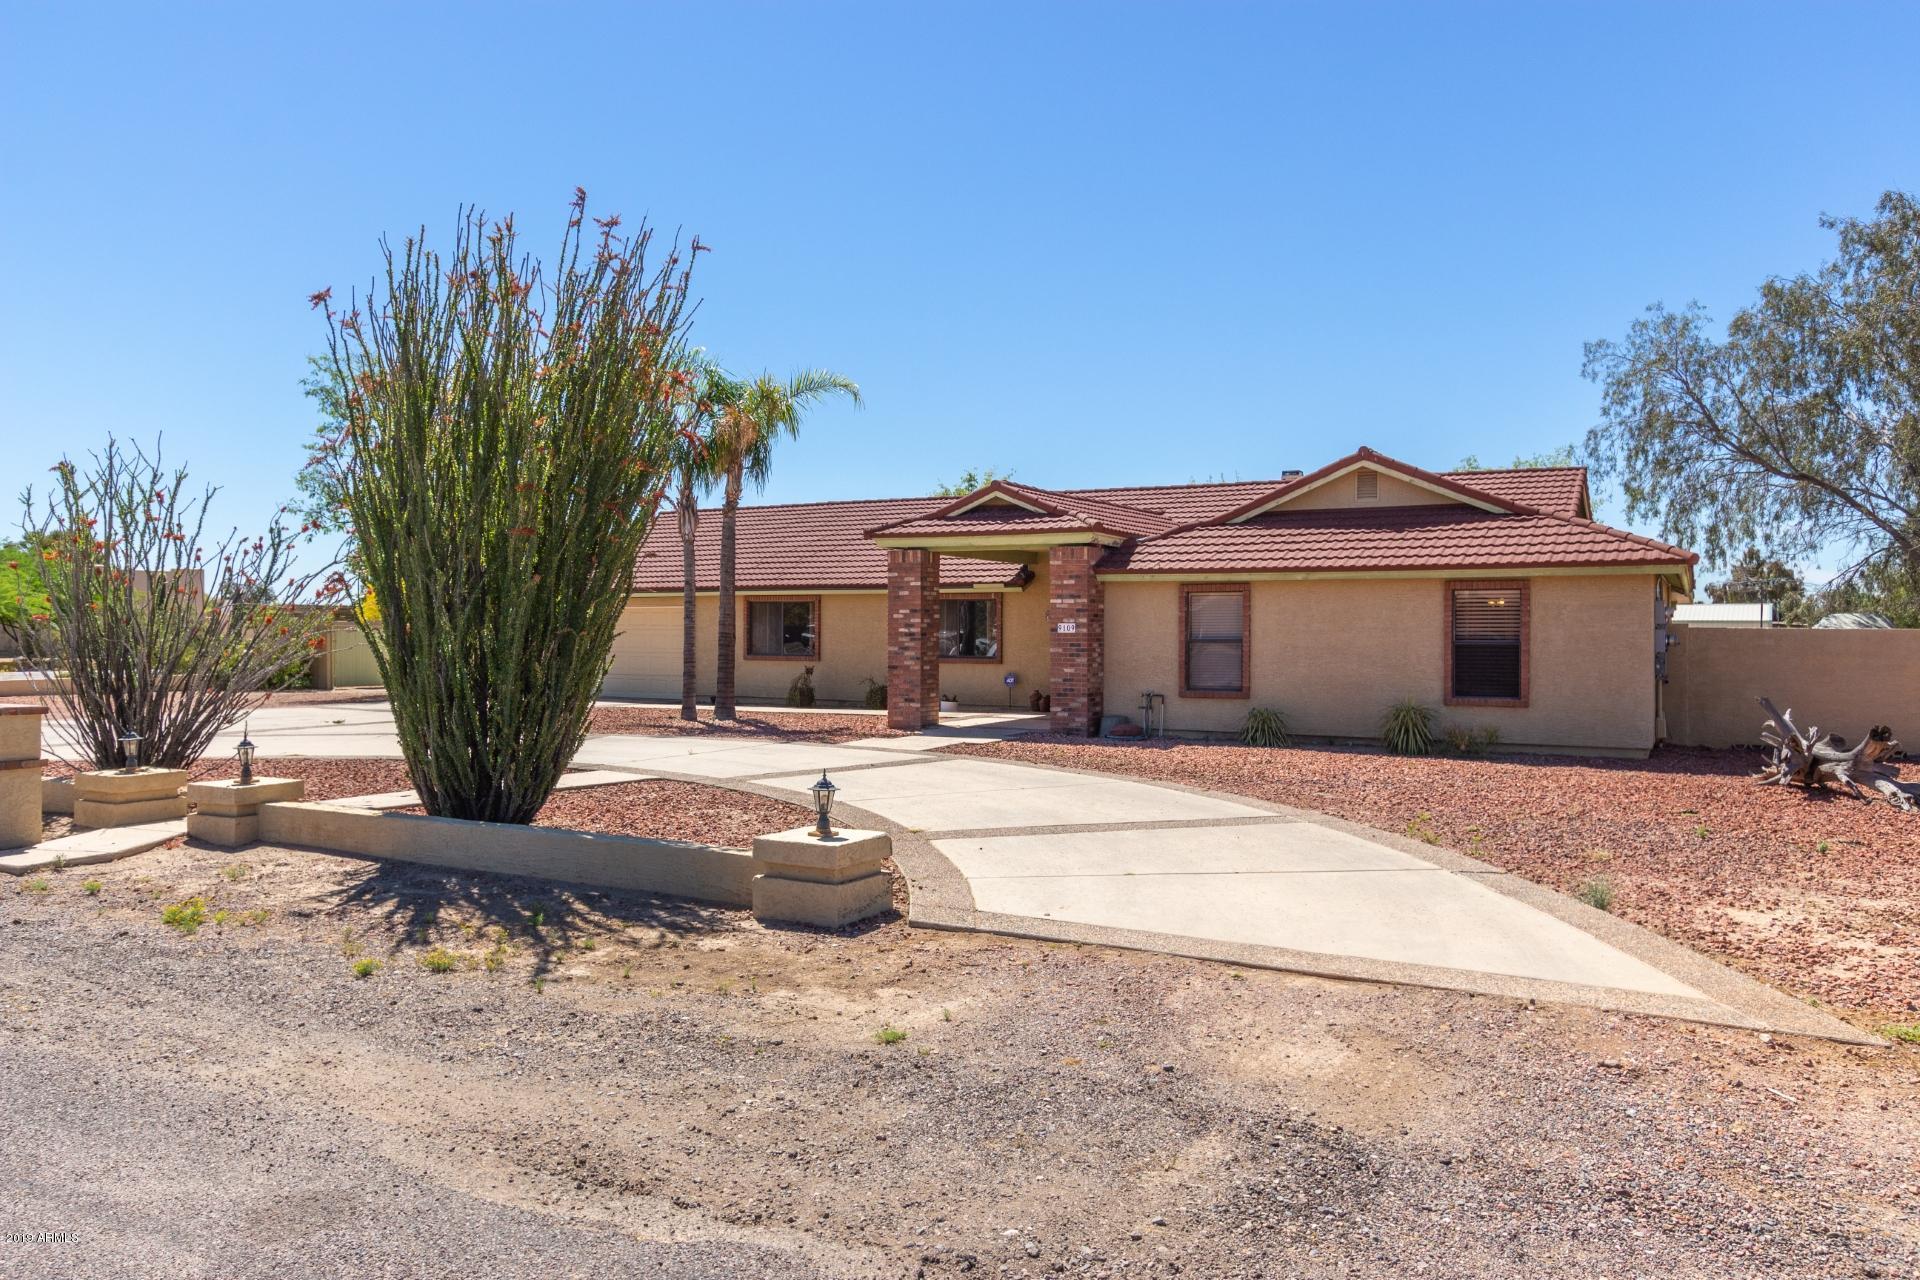 Photo of 9109 W VILLA LINDO Drive, Peoria, AZ 85383